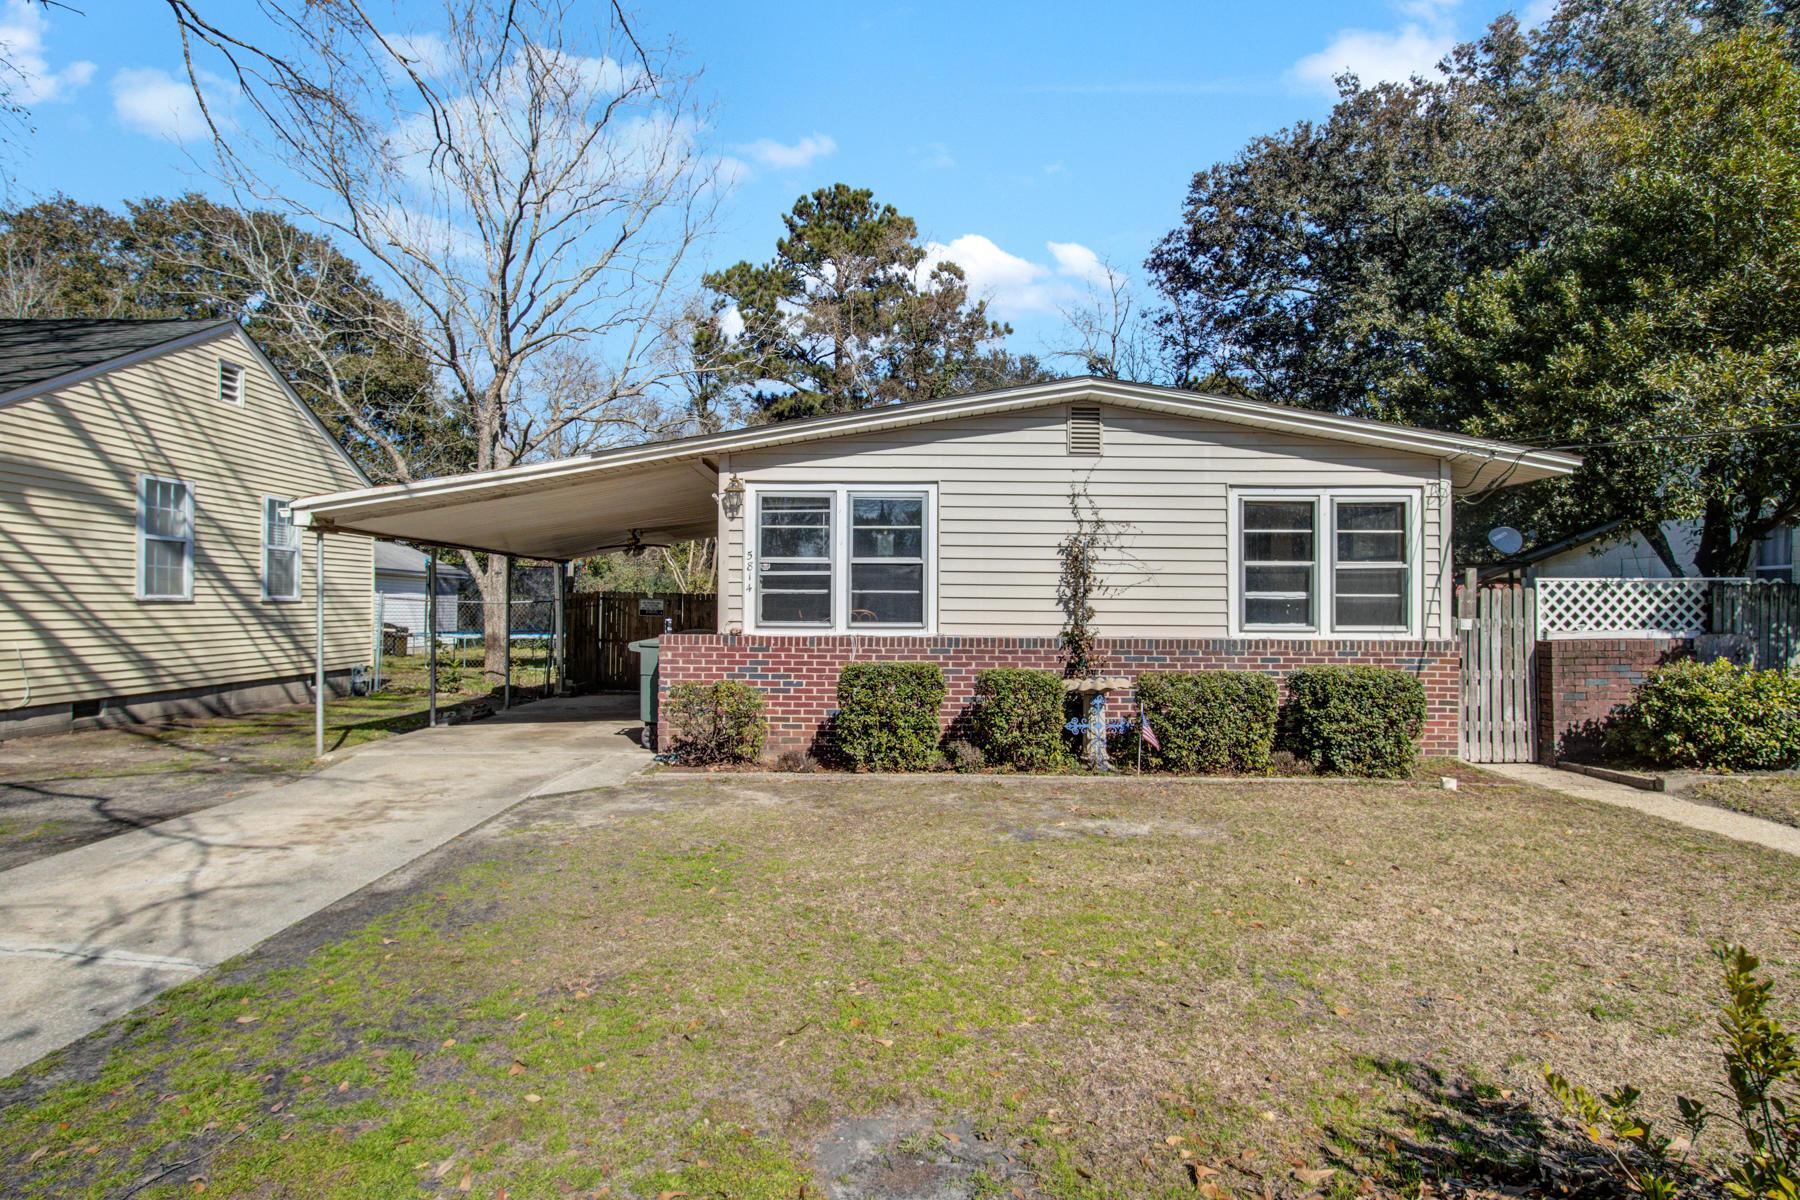 Port Park Homes For Sale - 5814 Moore, Hanahan, SC - 31